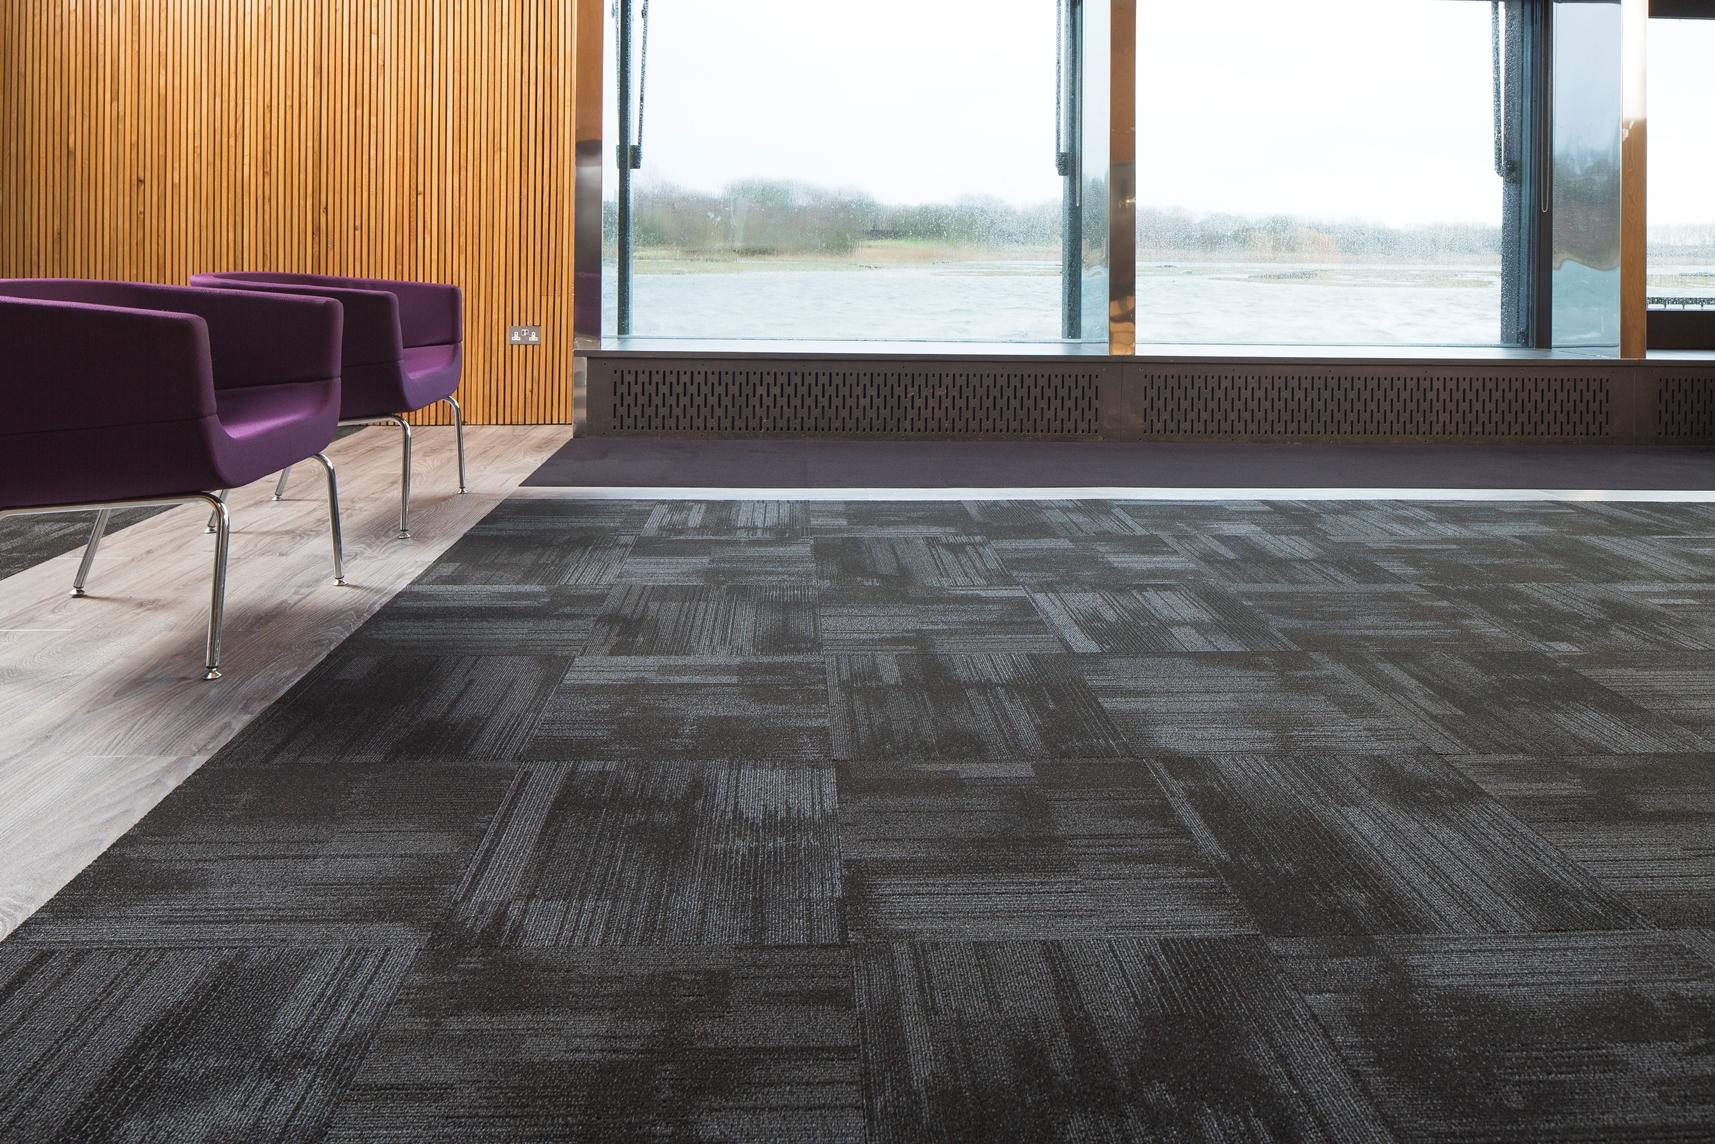 Buy Best Vinyl Carpet Tiles Dubai  Abu Dhabi  Al Ain  UAE